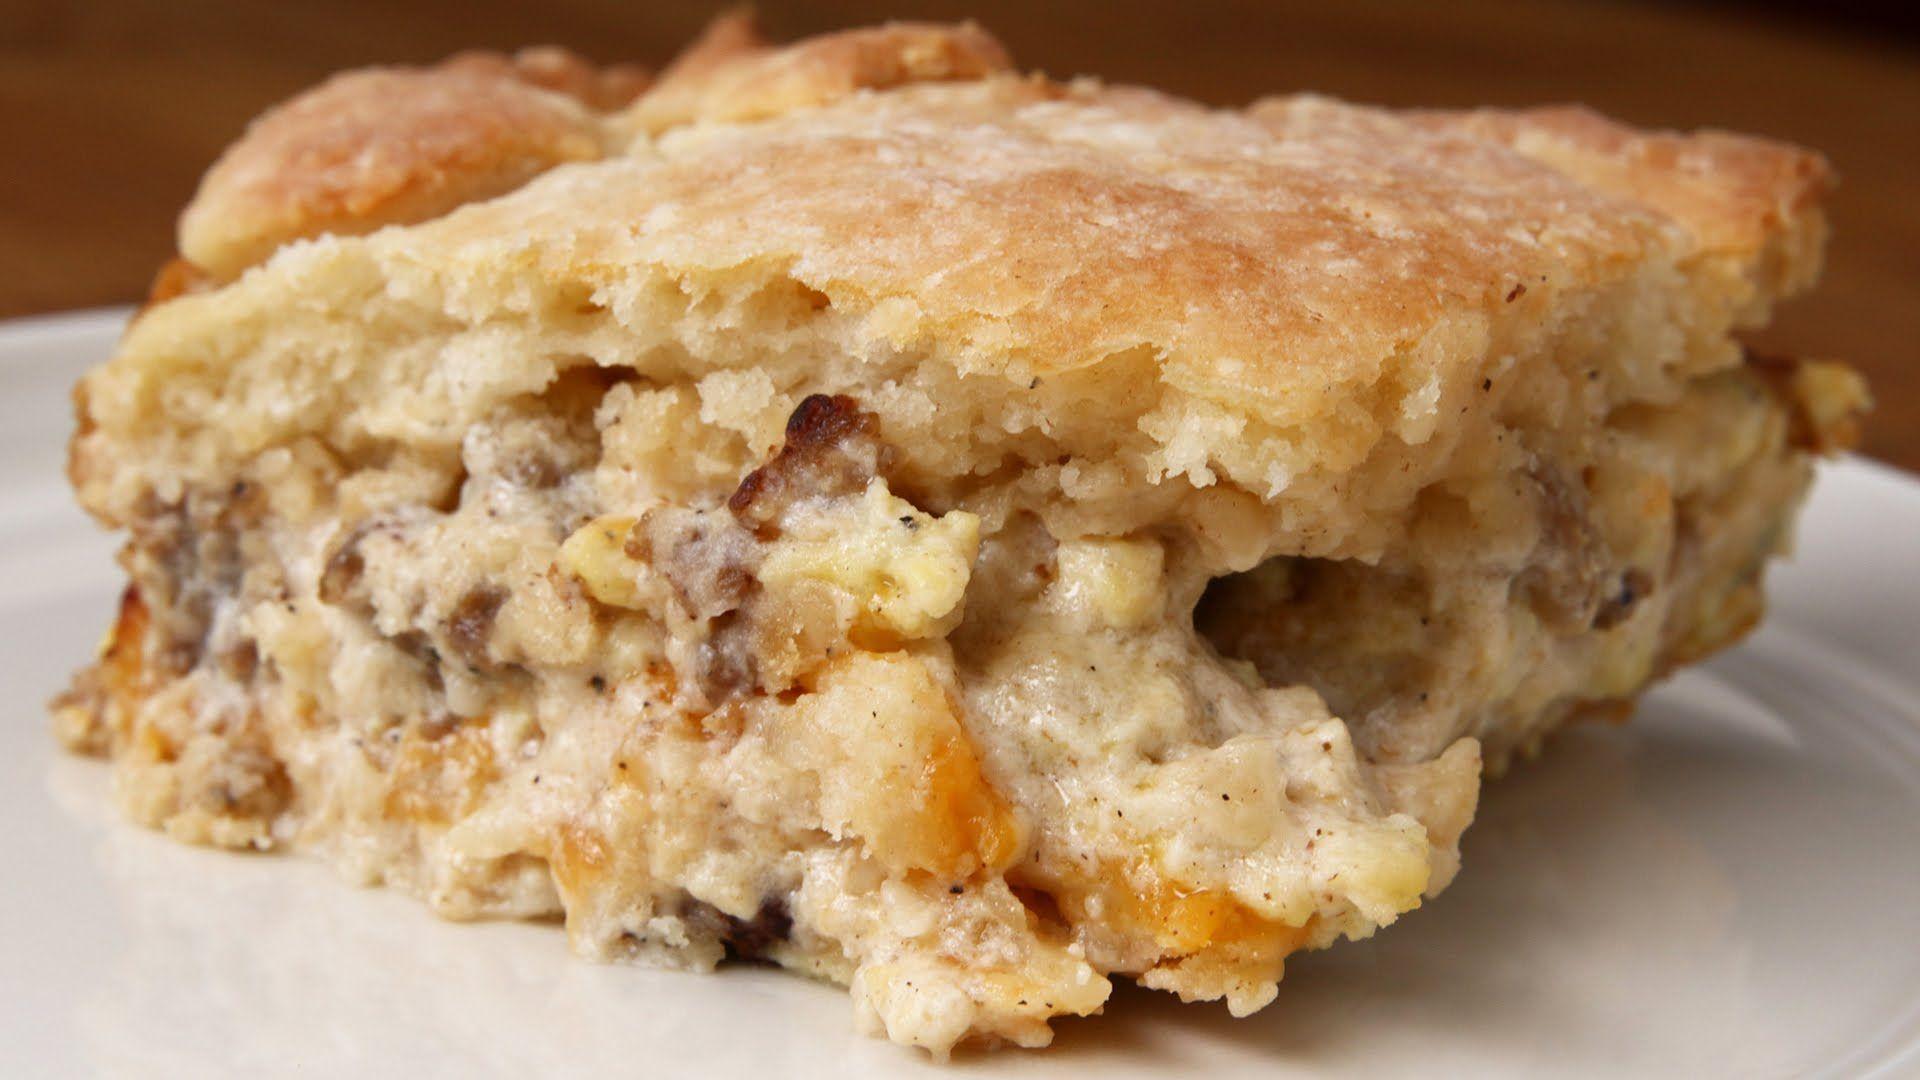 5-Layer Breakfast Bake